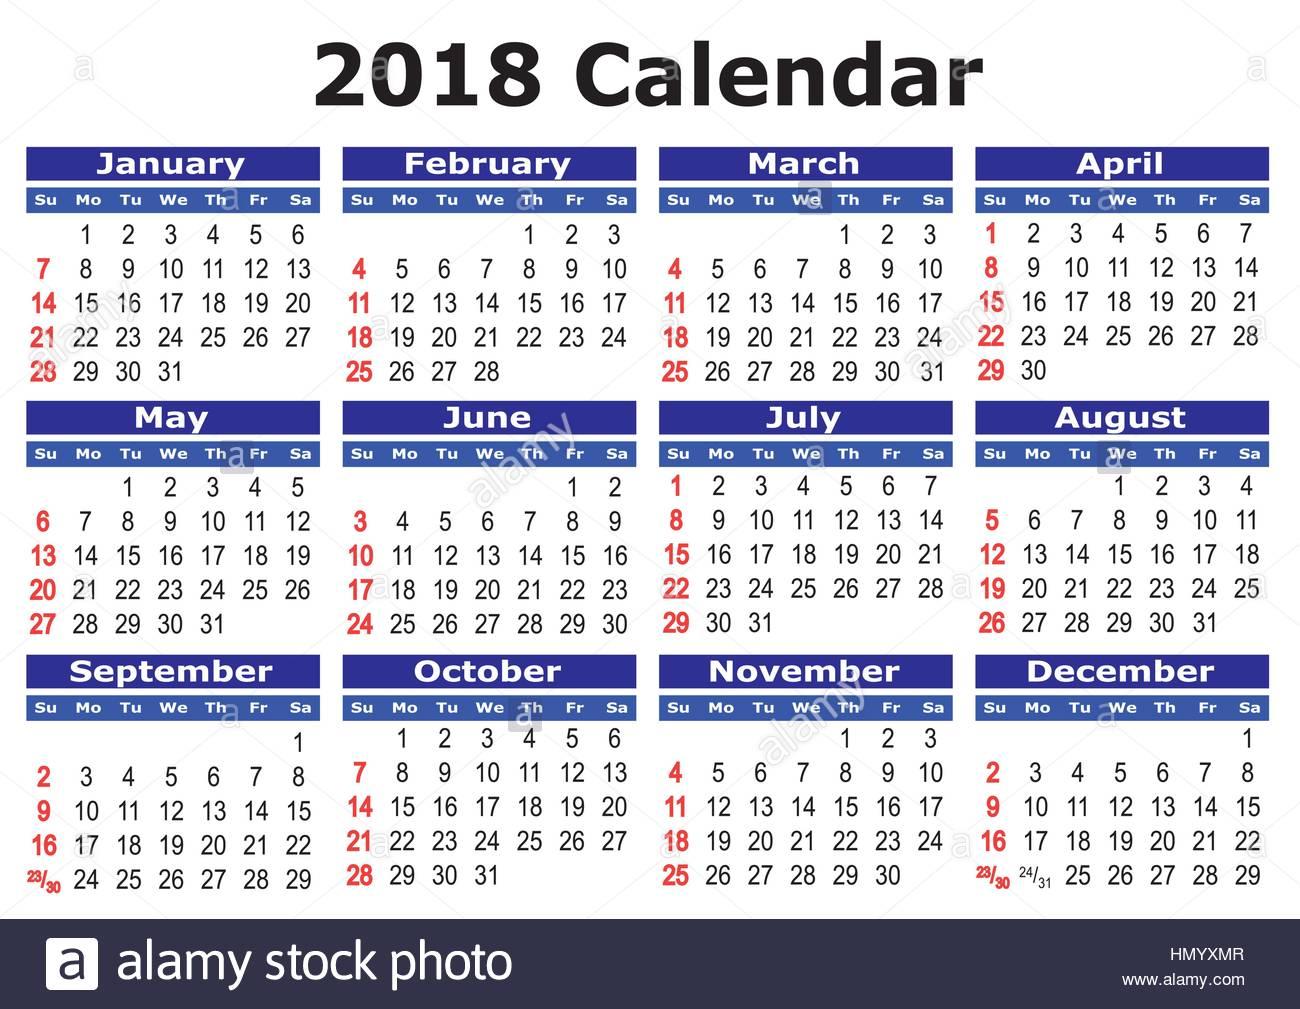 Calendar 2018 April Daily